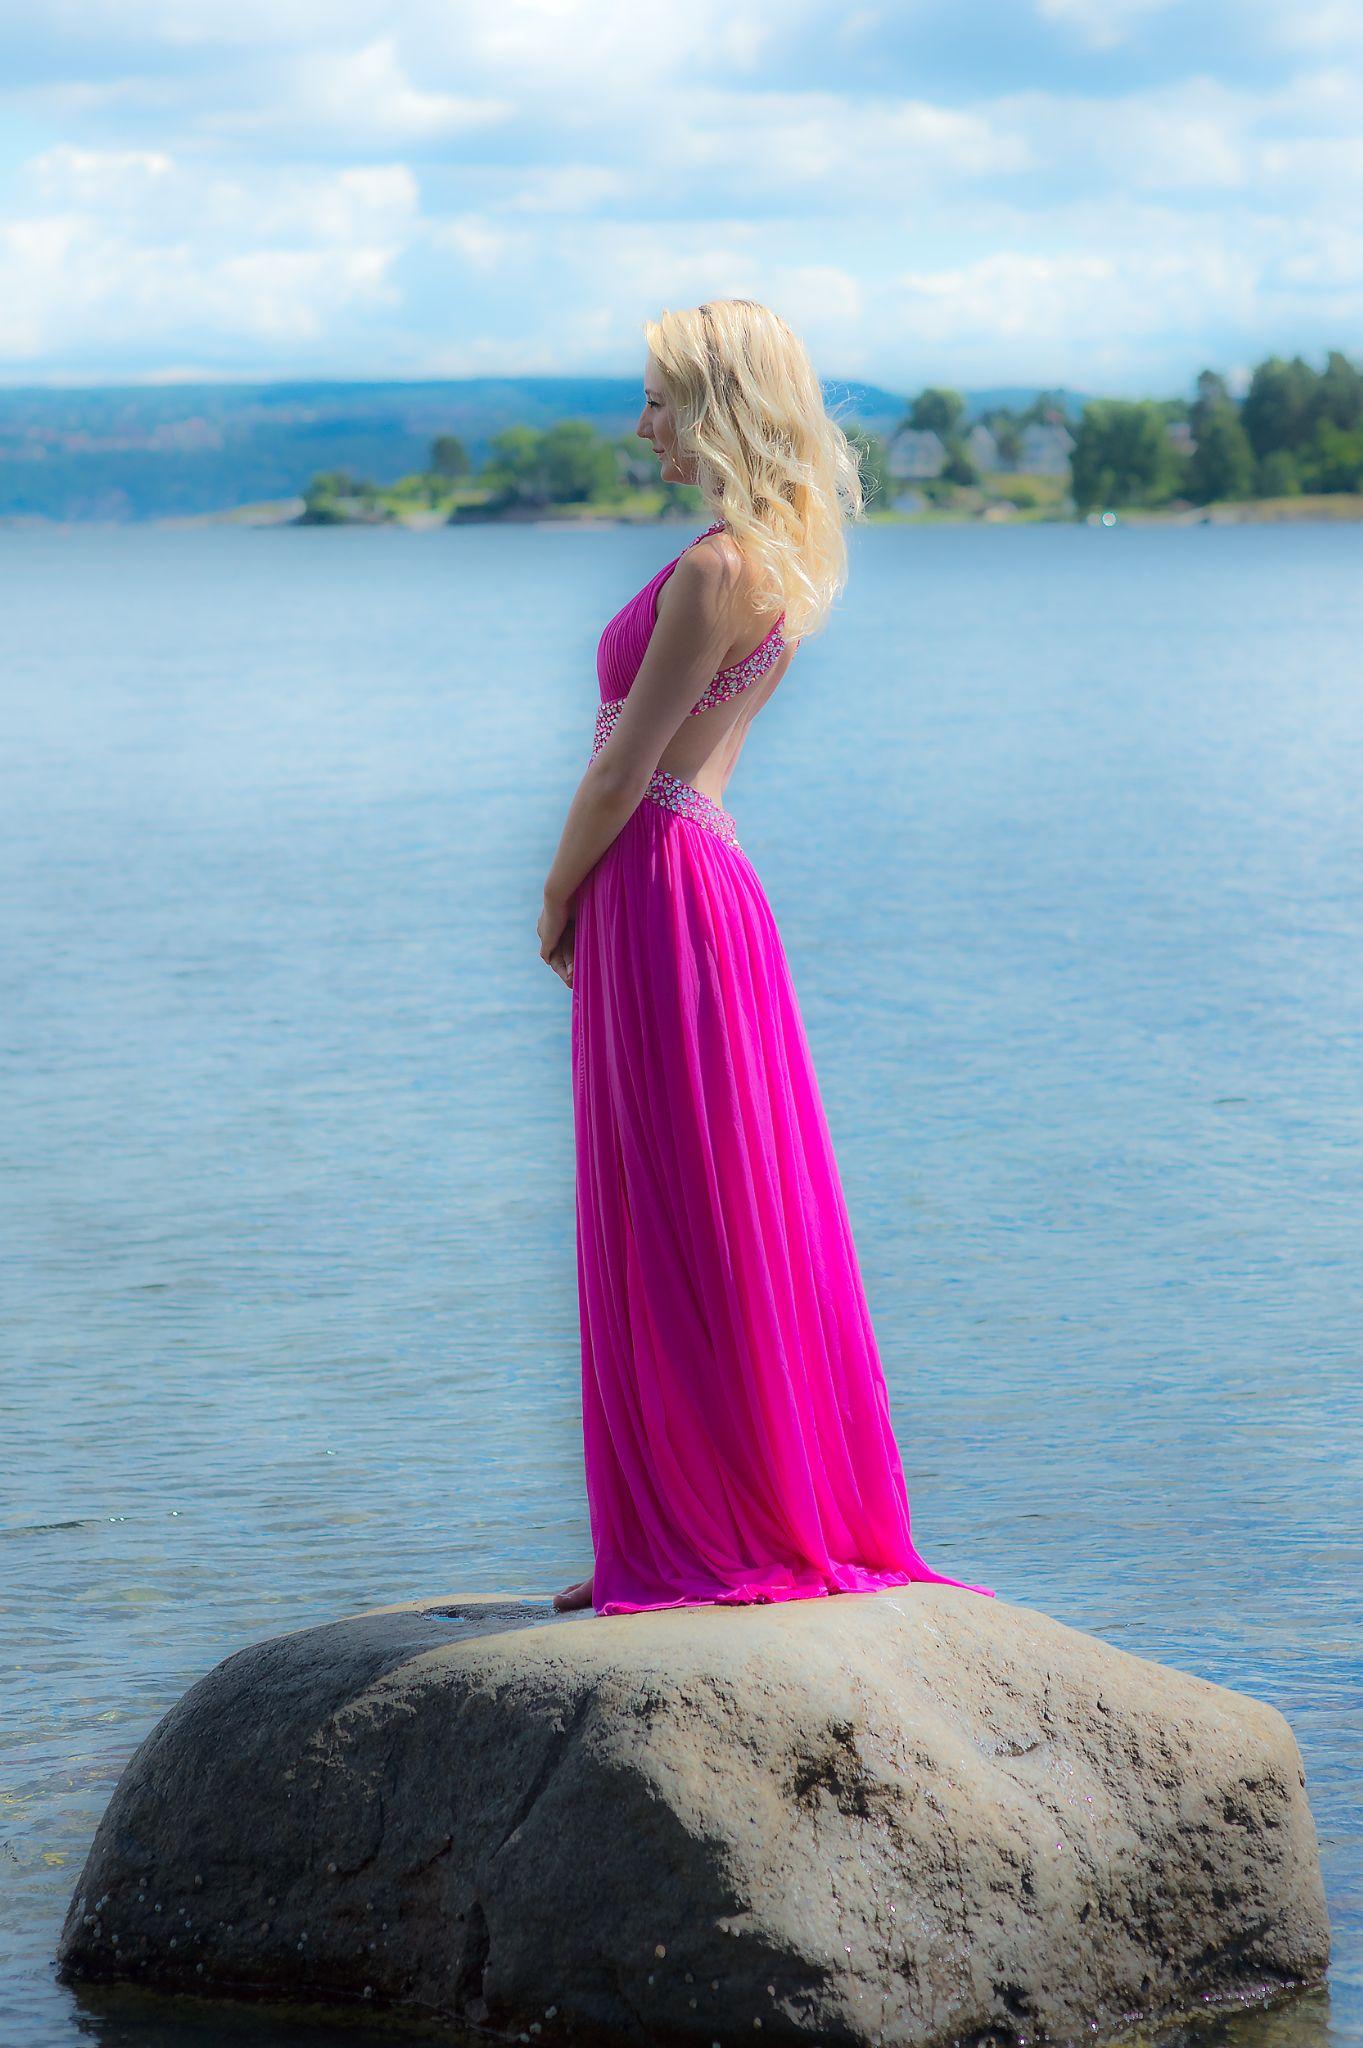 Summer dream by Hallgeir Nielsen